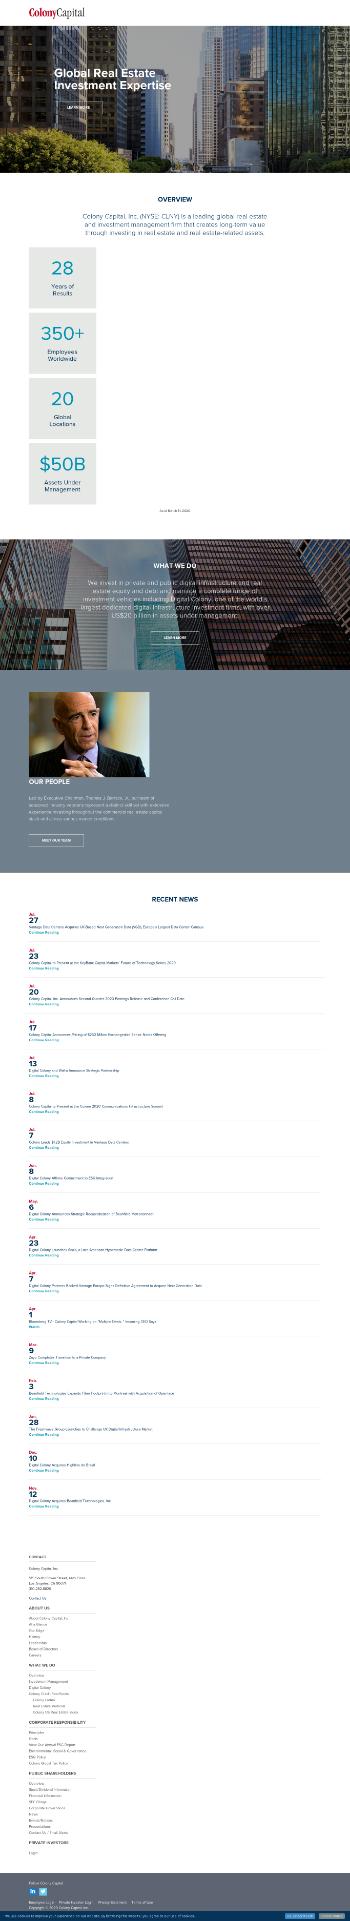 Colony Capital, Inc. Website Screenshot